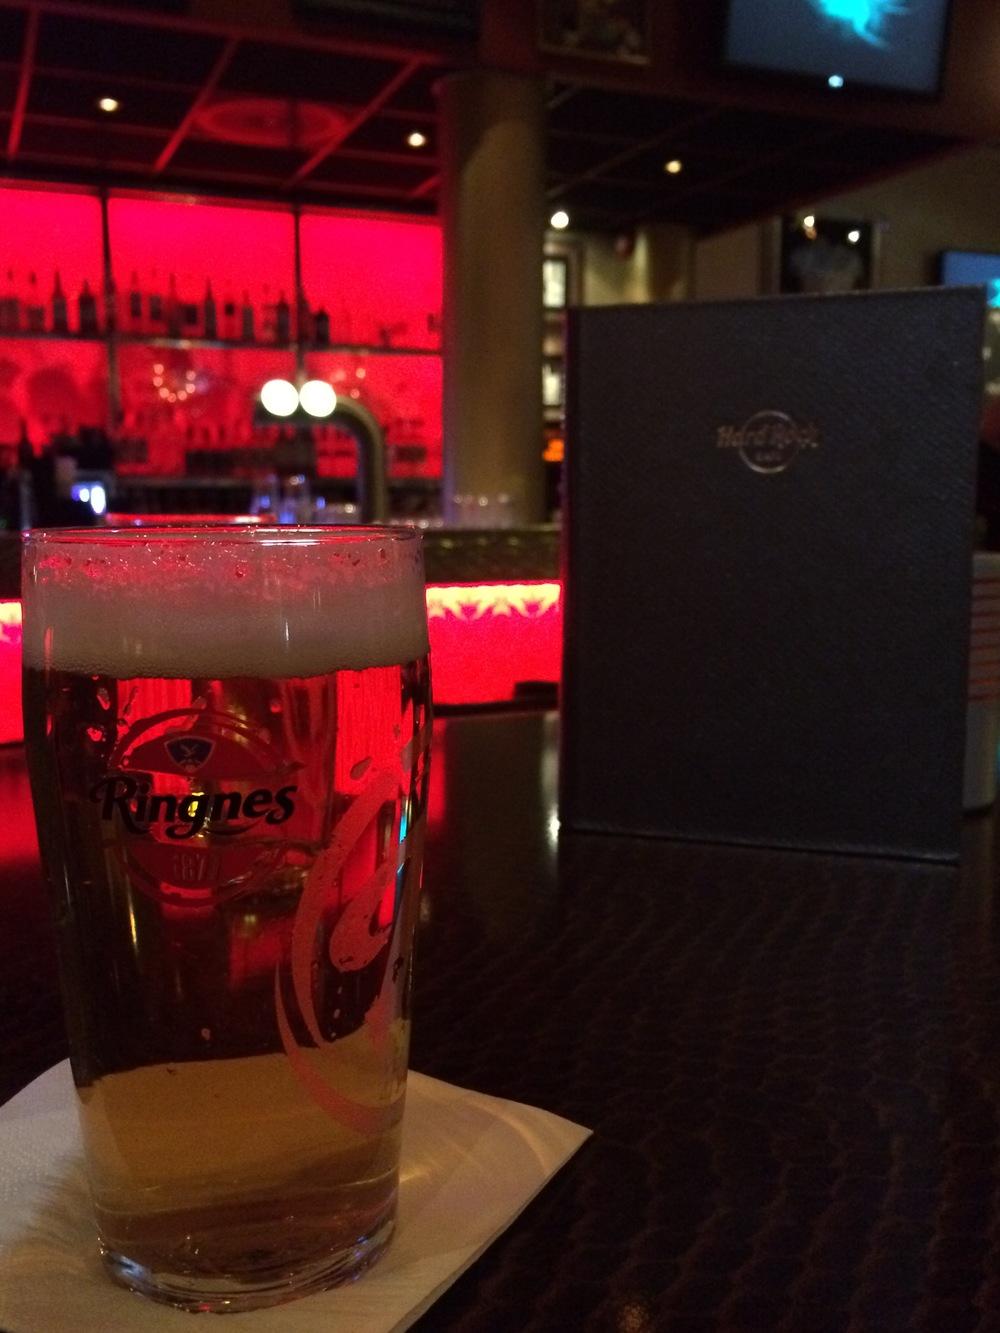 Despite the price, I enjoyed the beer at Hard Rock Cafe Oslo.